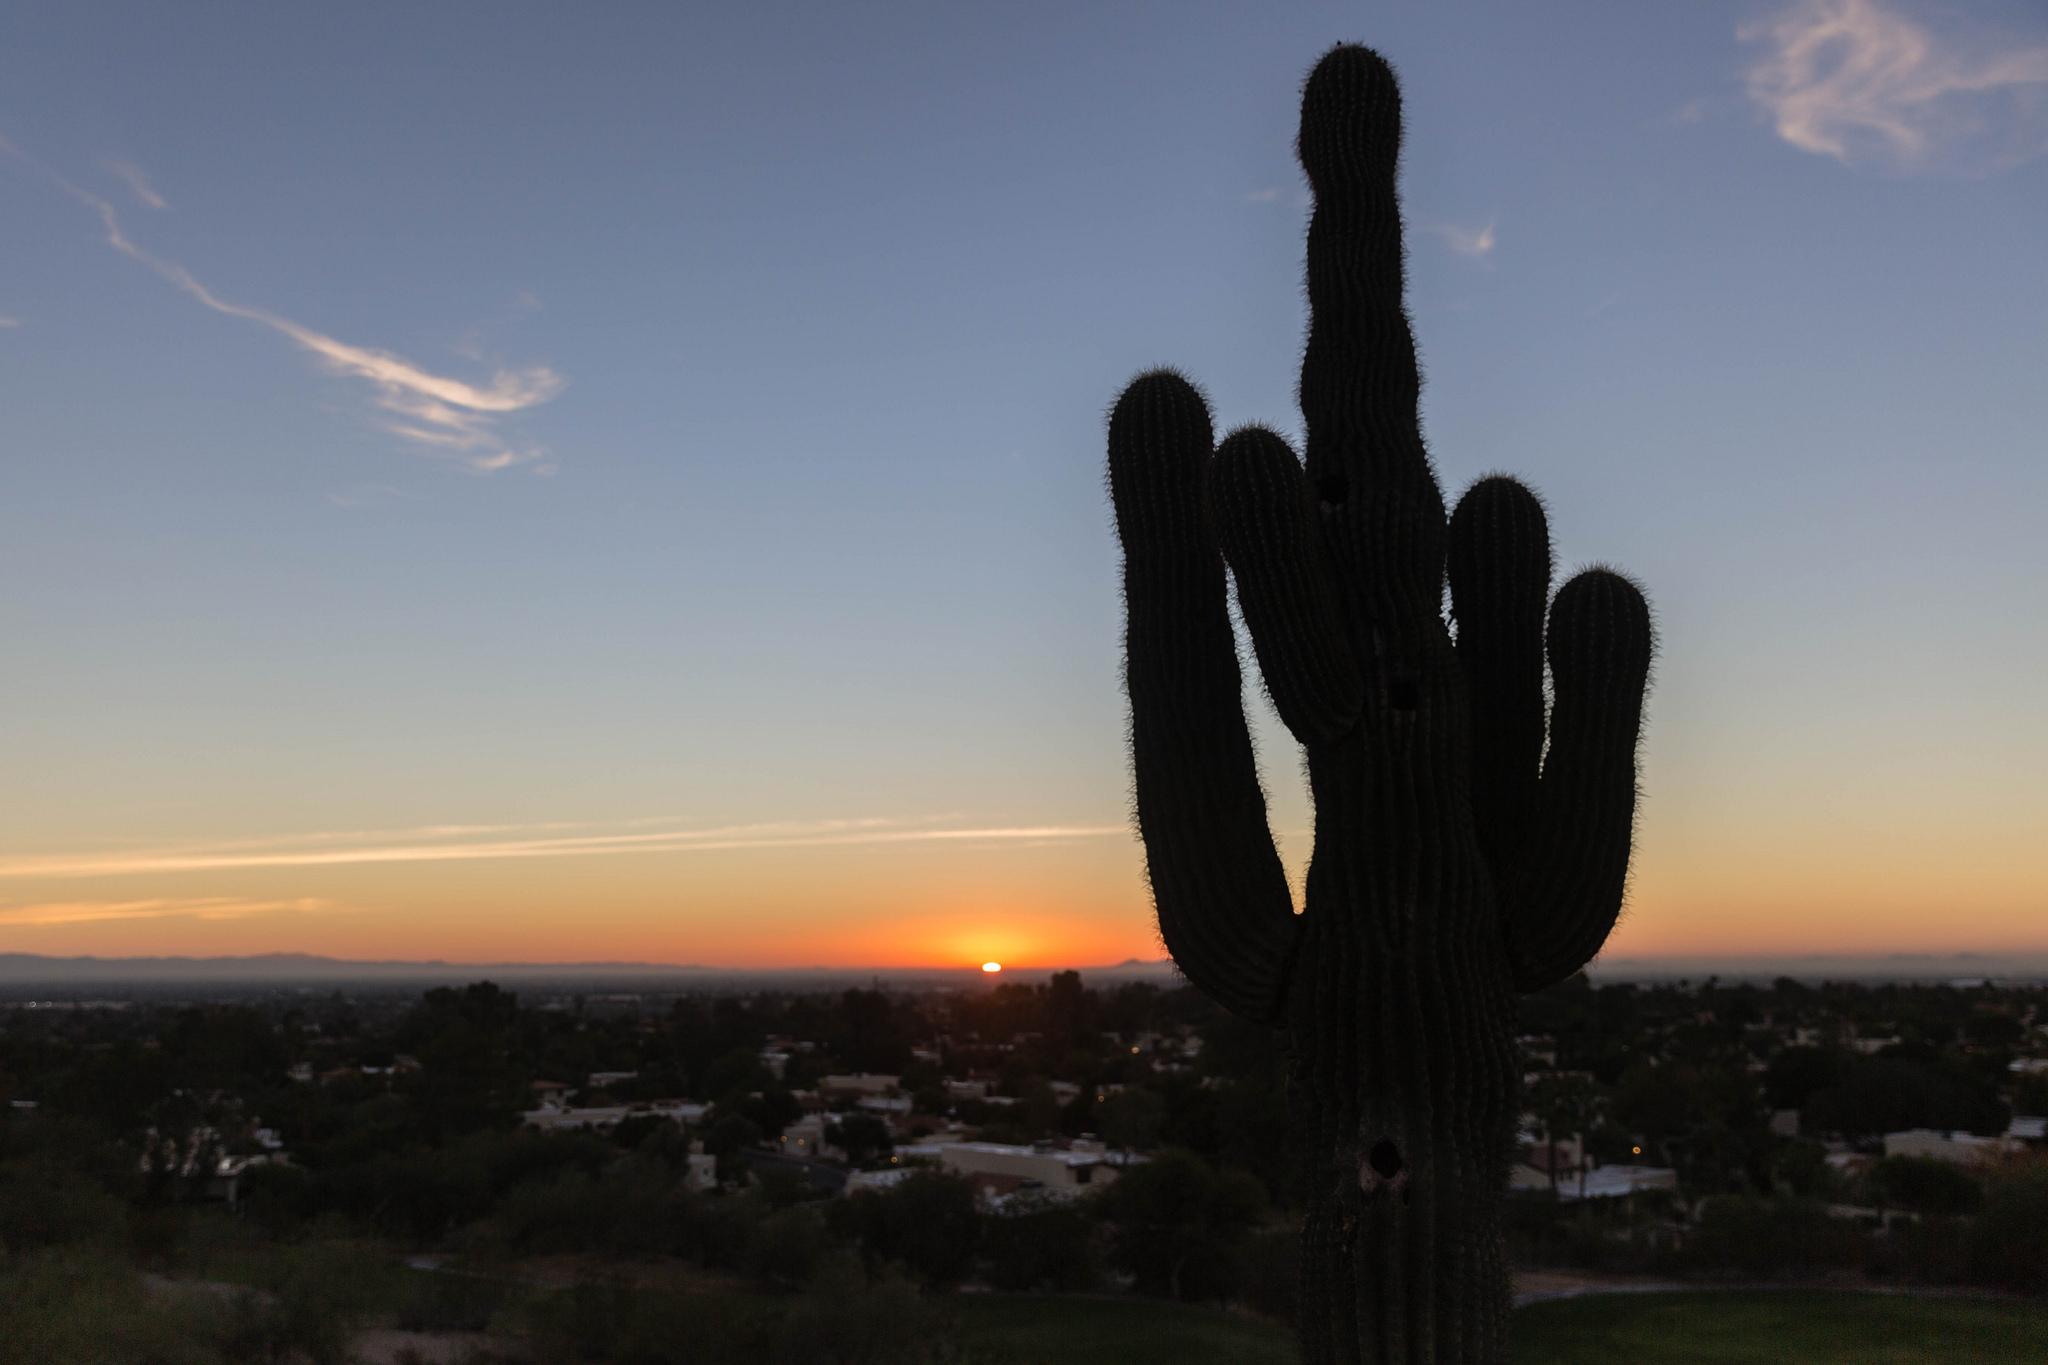 Go to hell sunrise, Phoenix Arizona